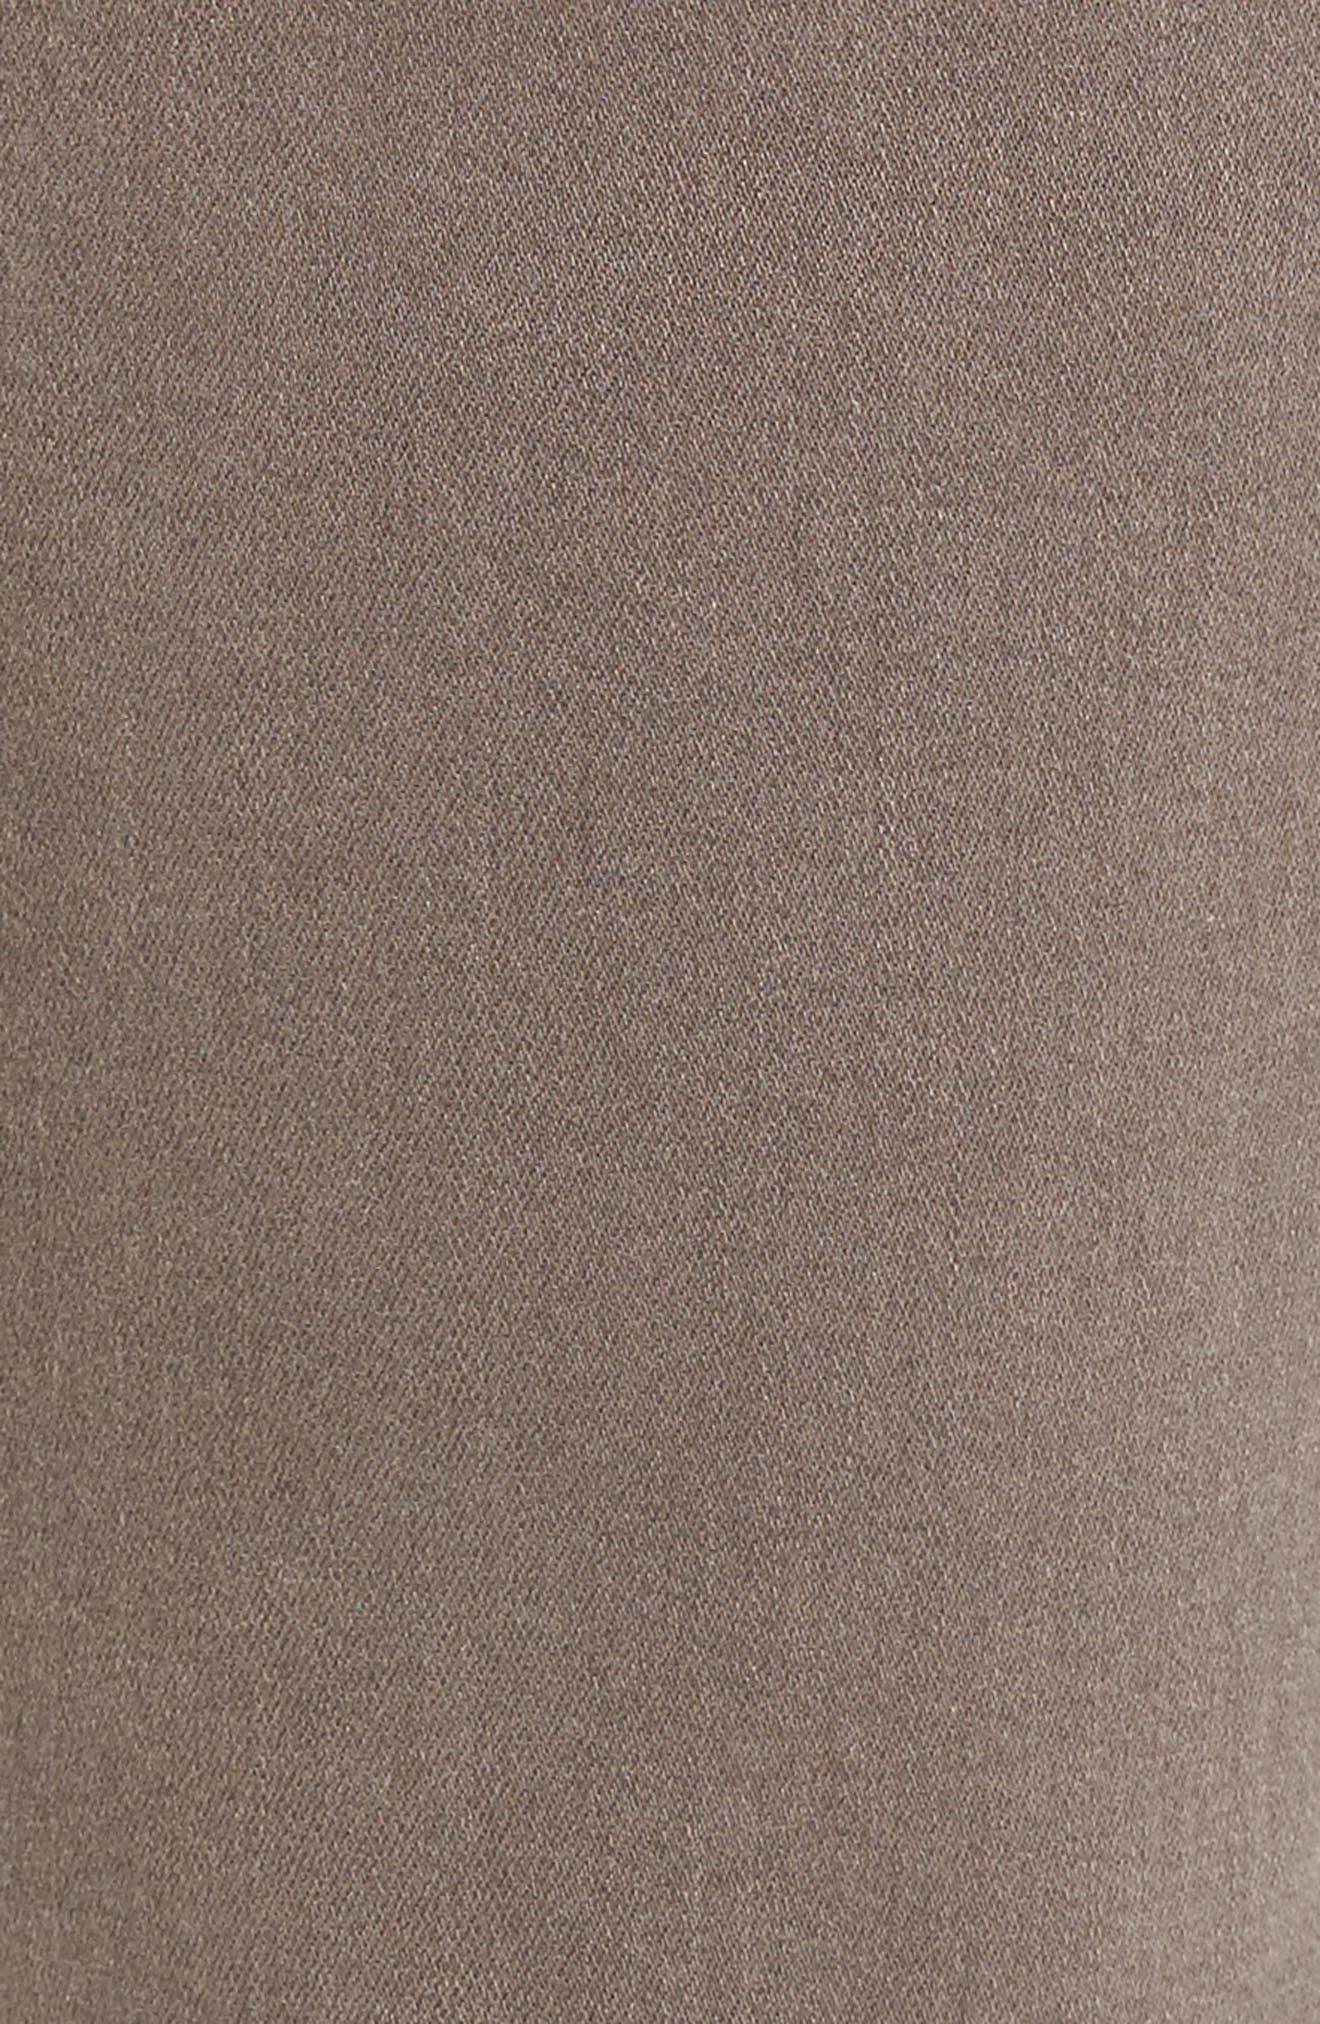 Transcend - Lennox Slim Fit Jeans,                             Alternate thumbnail 5, color,                             VINTAGE SAND BAR